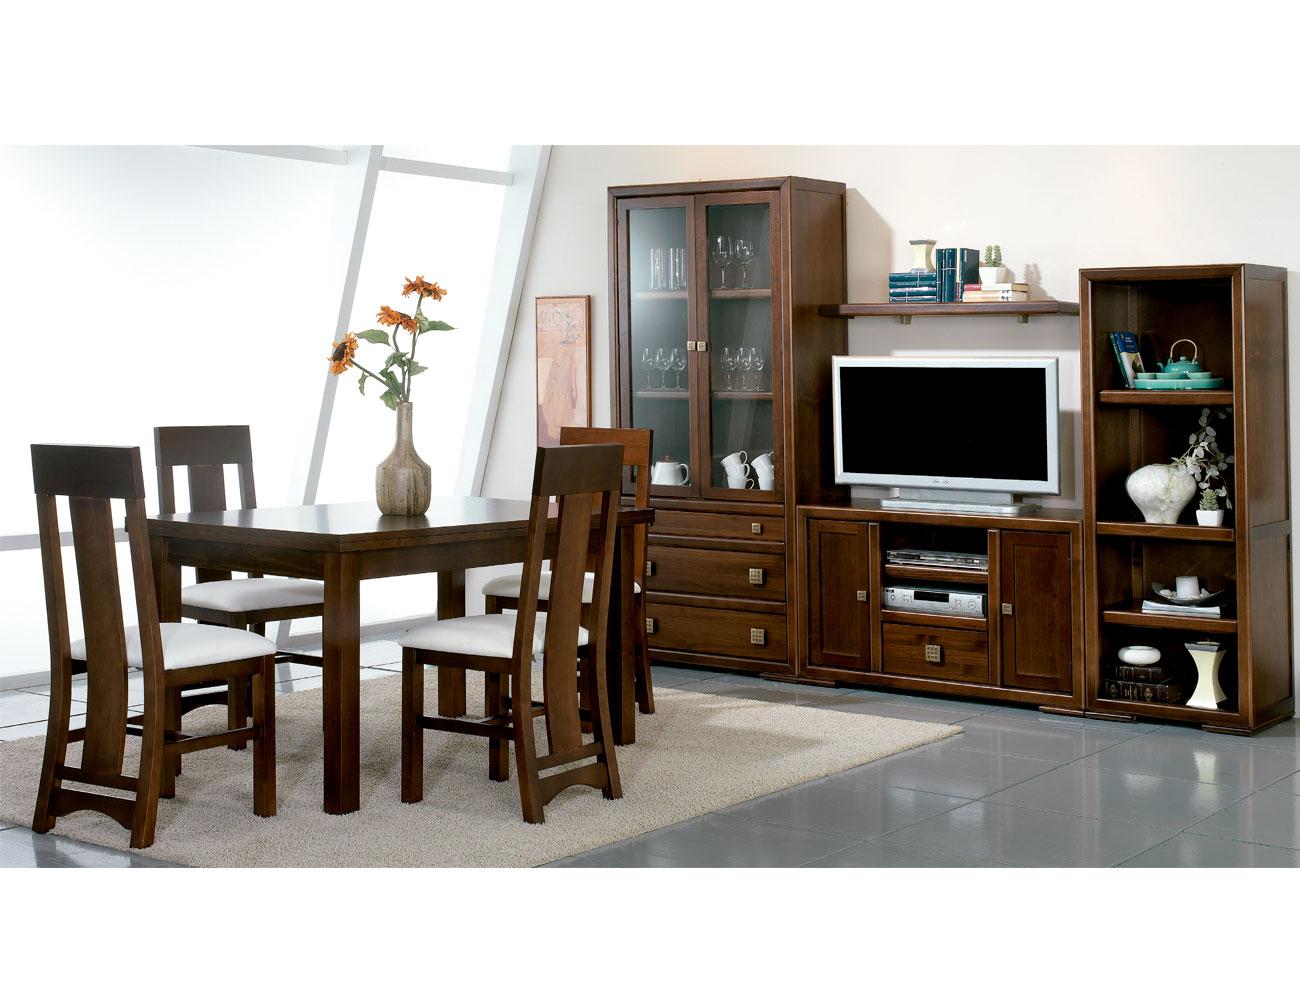 Composicion12 mueble salon comedor mesa silla